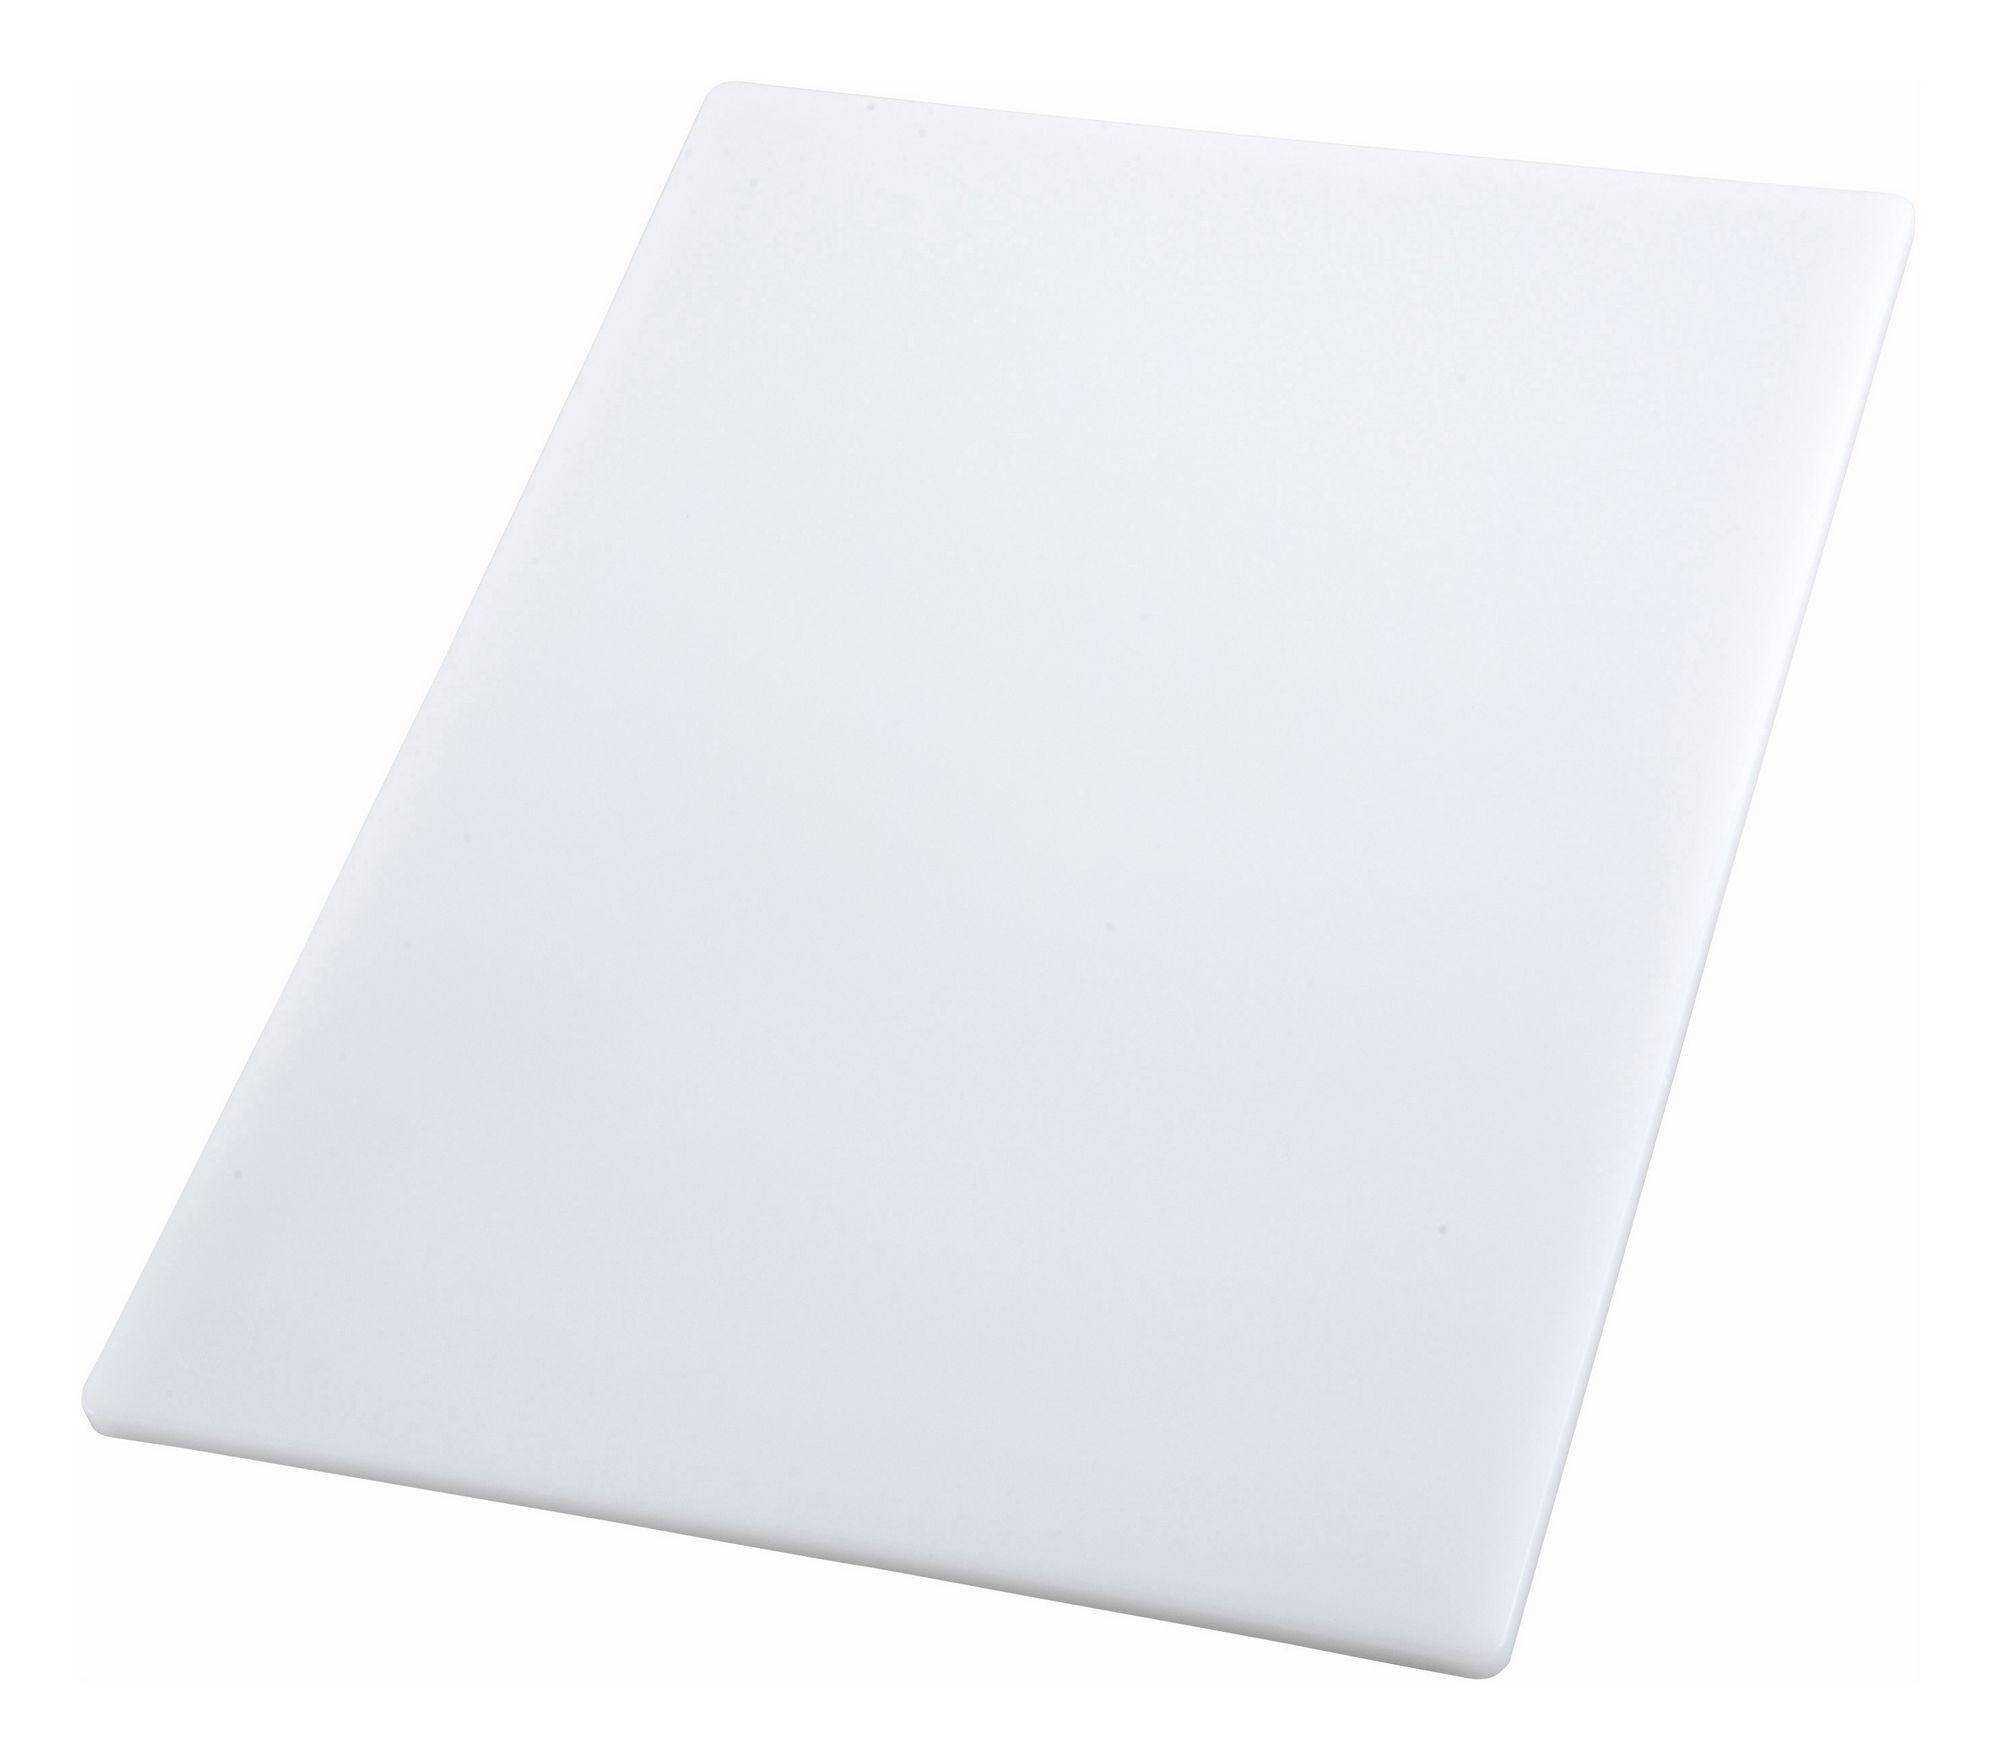 "Winco CBWT-1520 White Cutting Board 15"" x 20"" x 1/2"""